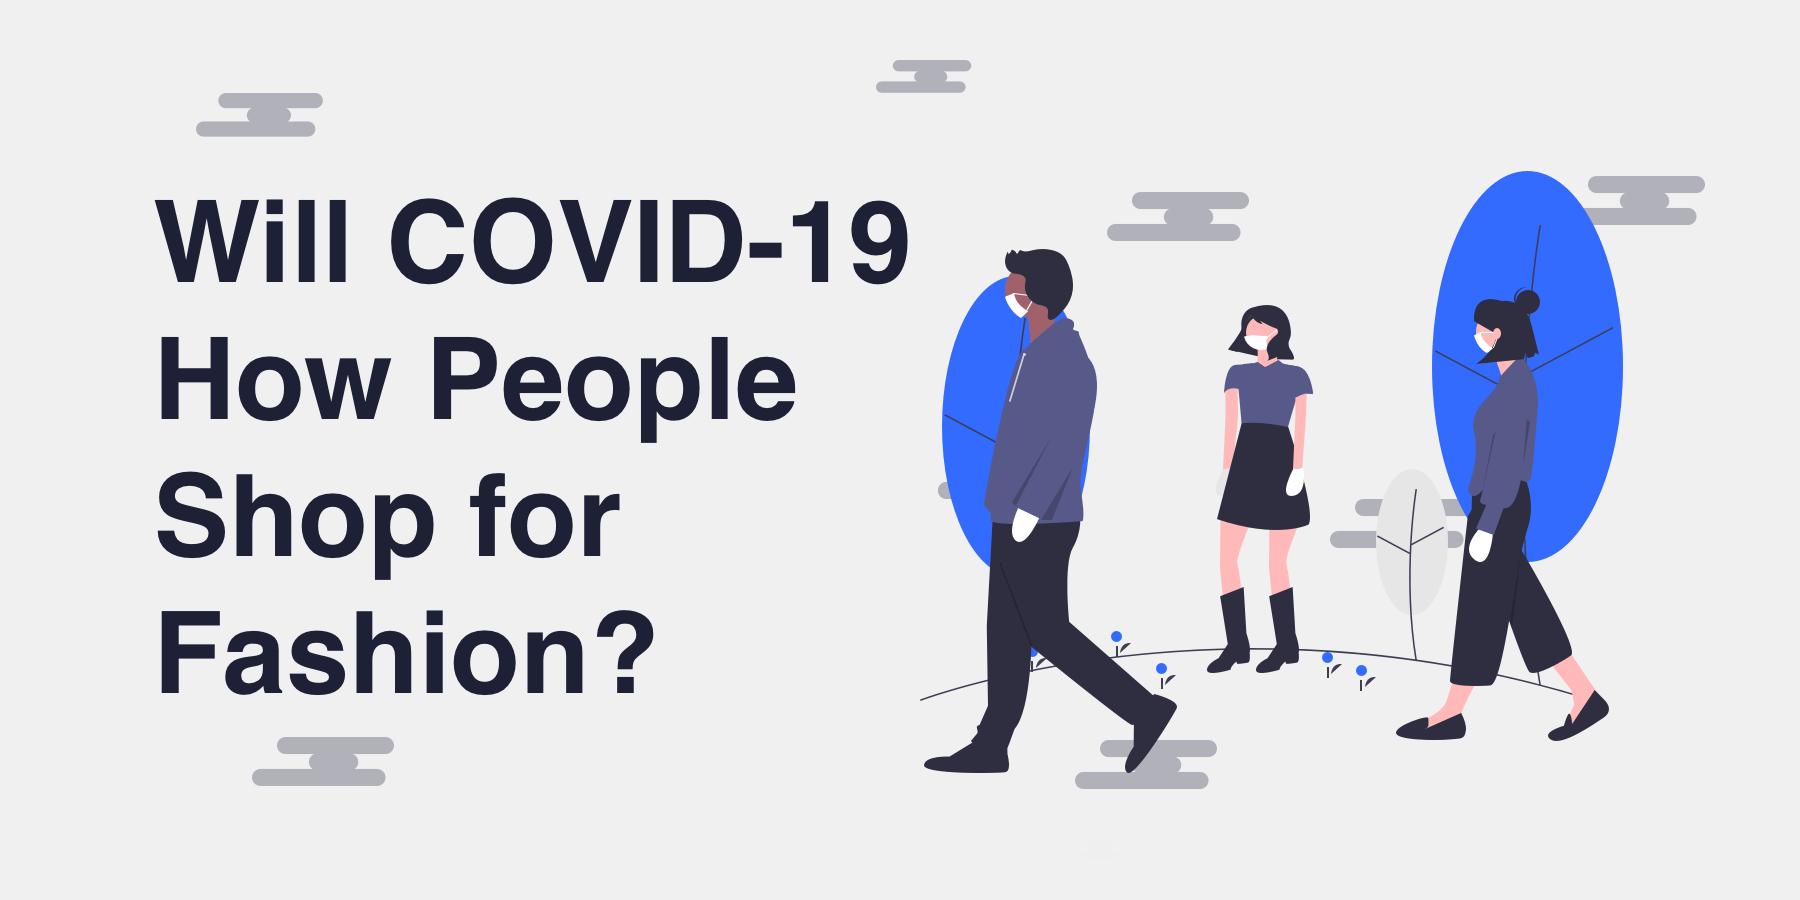 A COVID-19 vai mudar o comportamento do consumidor de moda online?